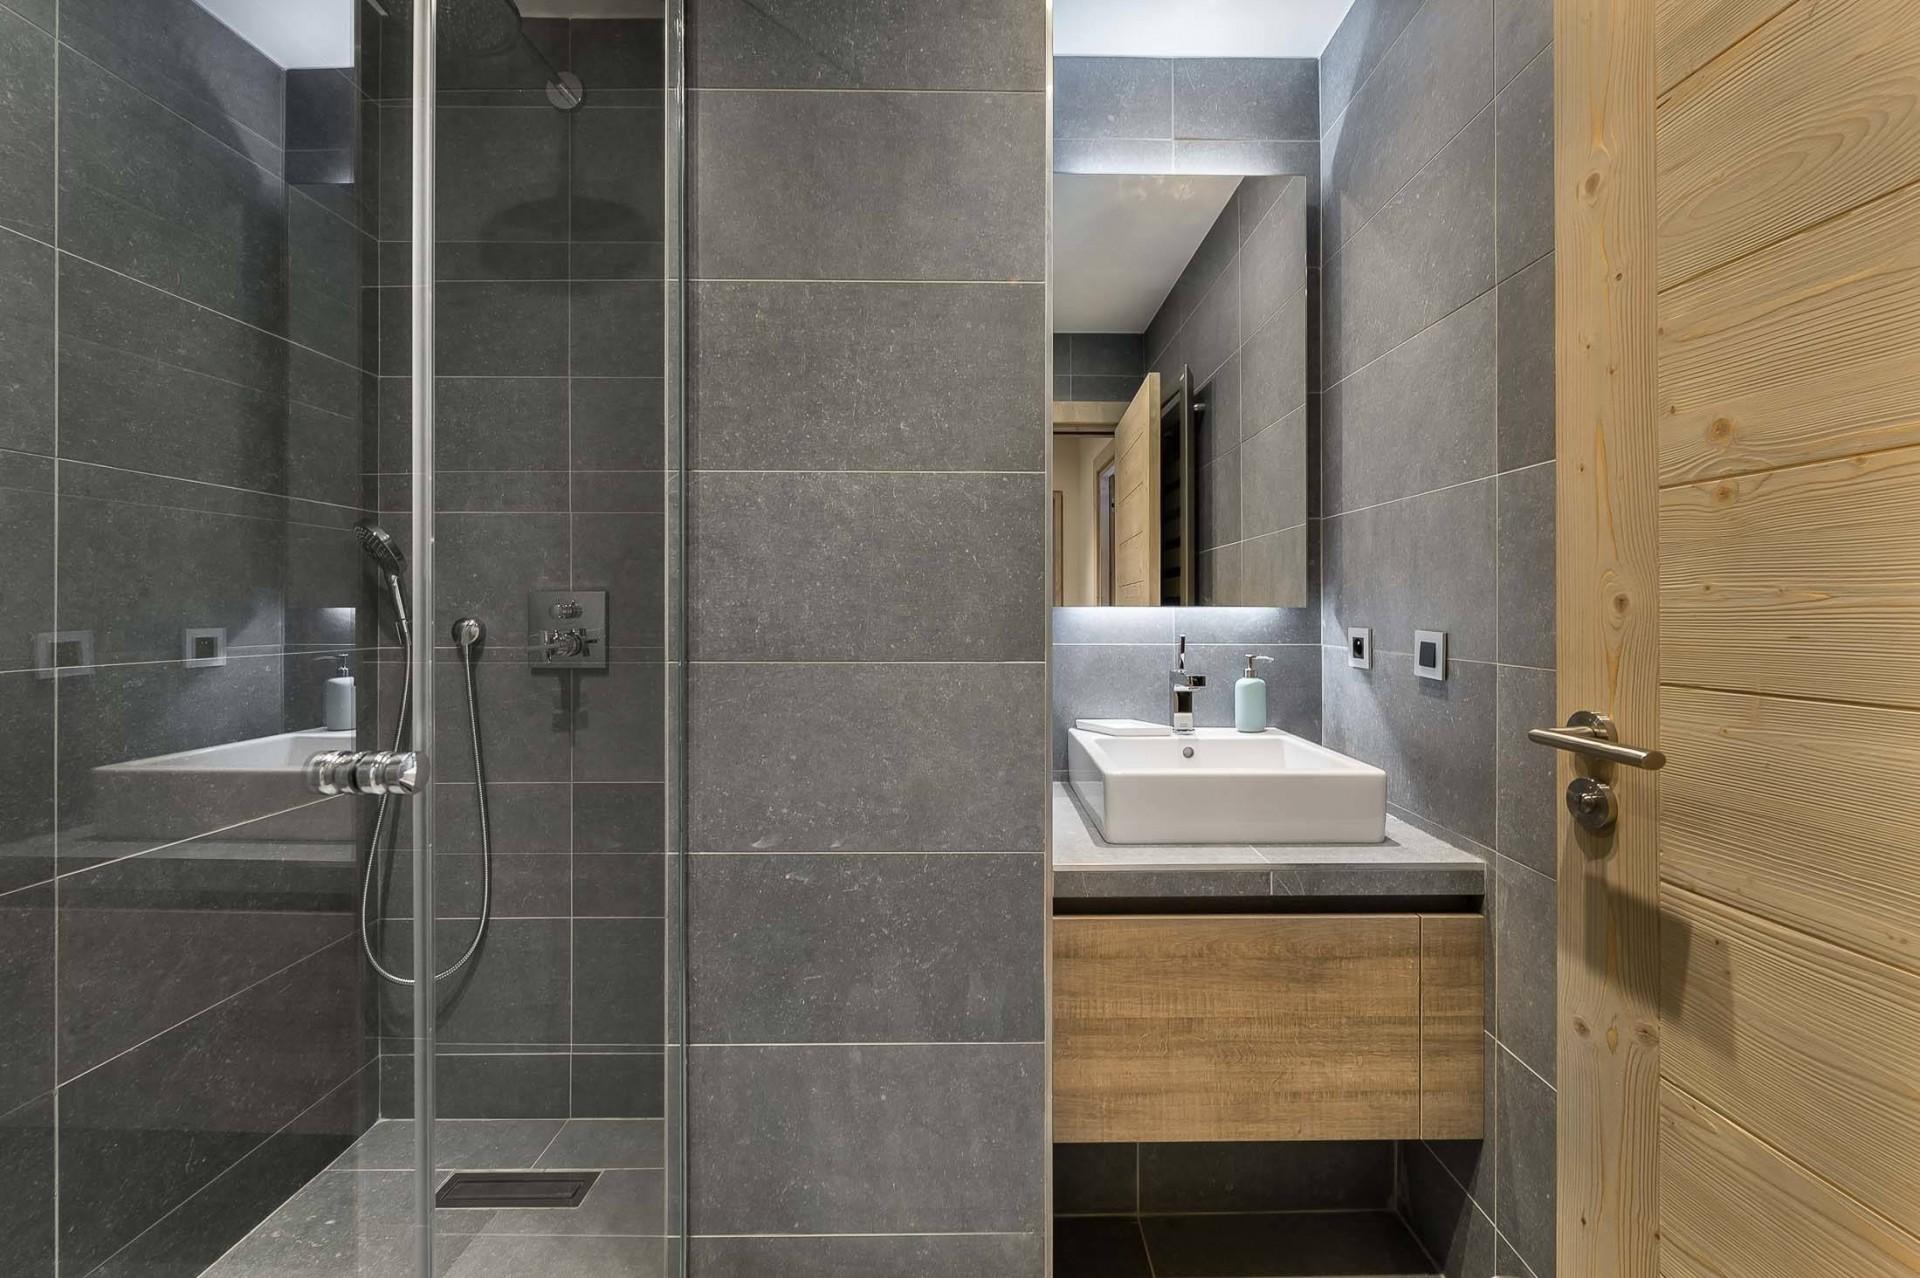 Val d'Isère Luxury Rental Appartment Cybalo Bathroom 2